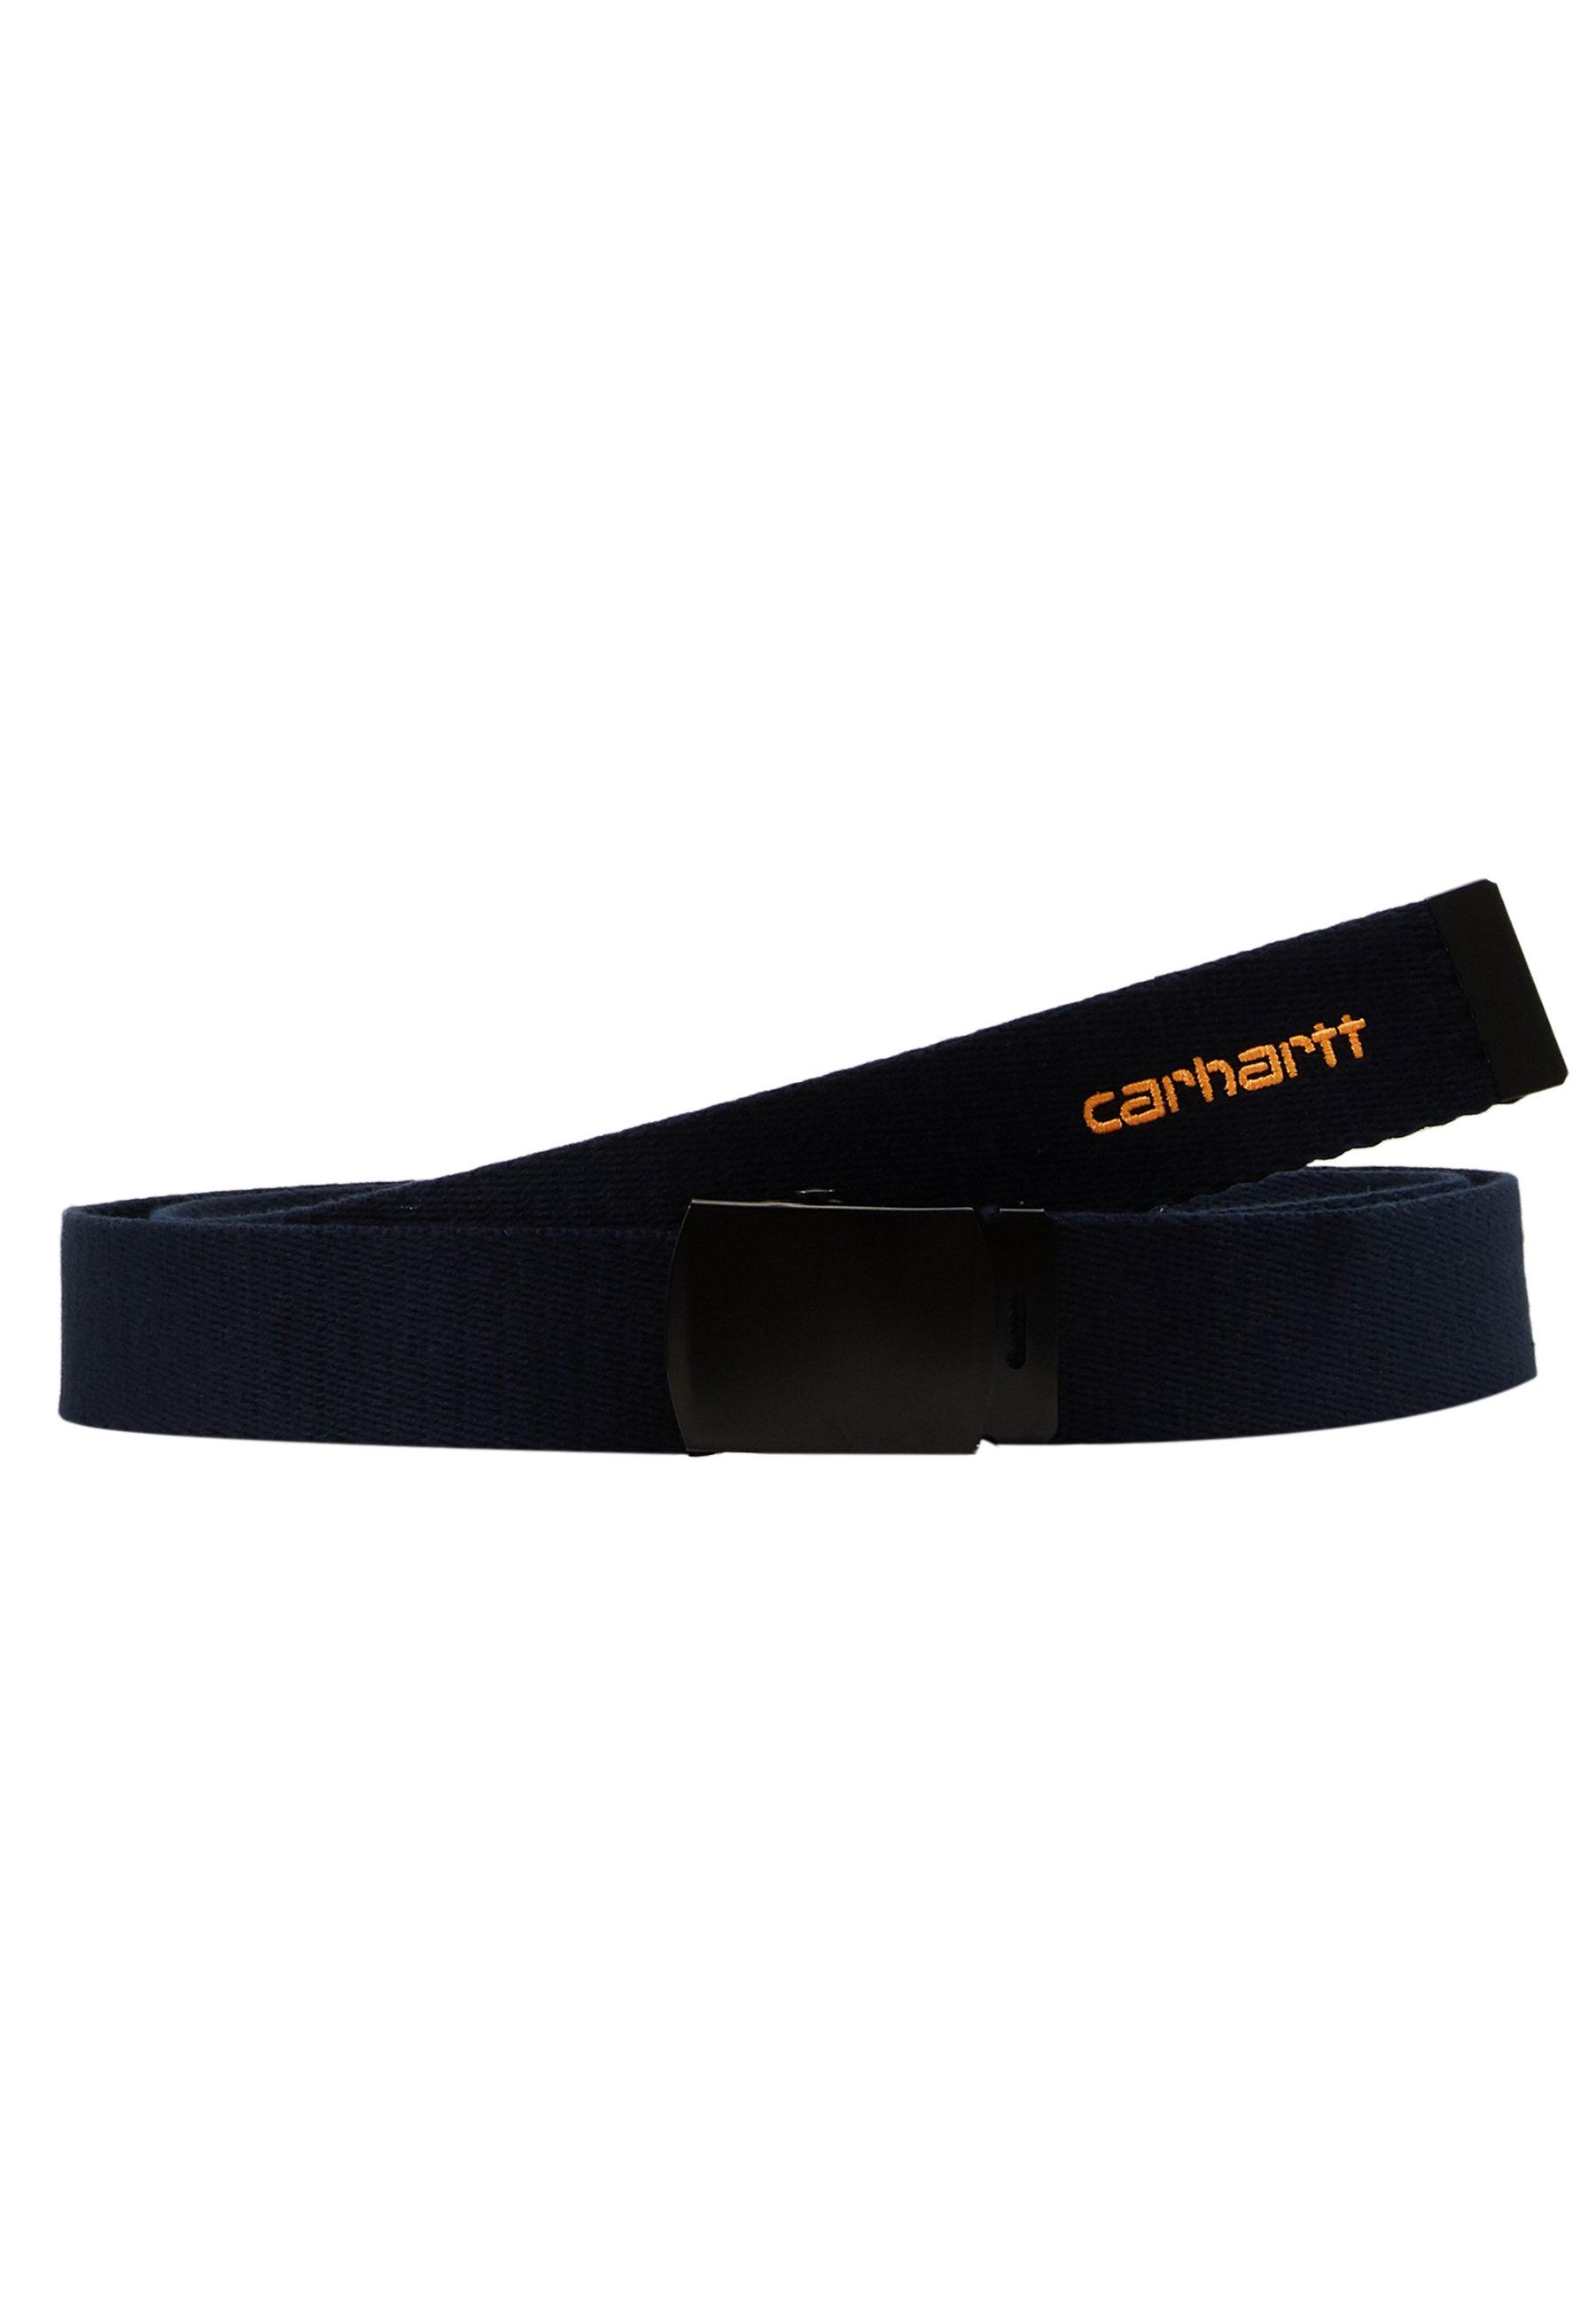 Carhartt WIP ORBIT BELT - Belte - dark navy/pop orange